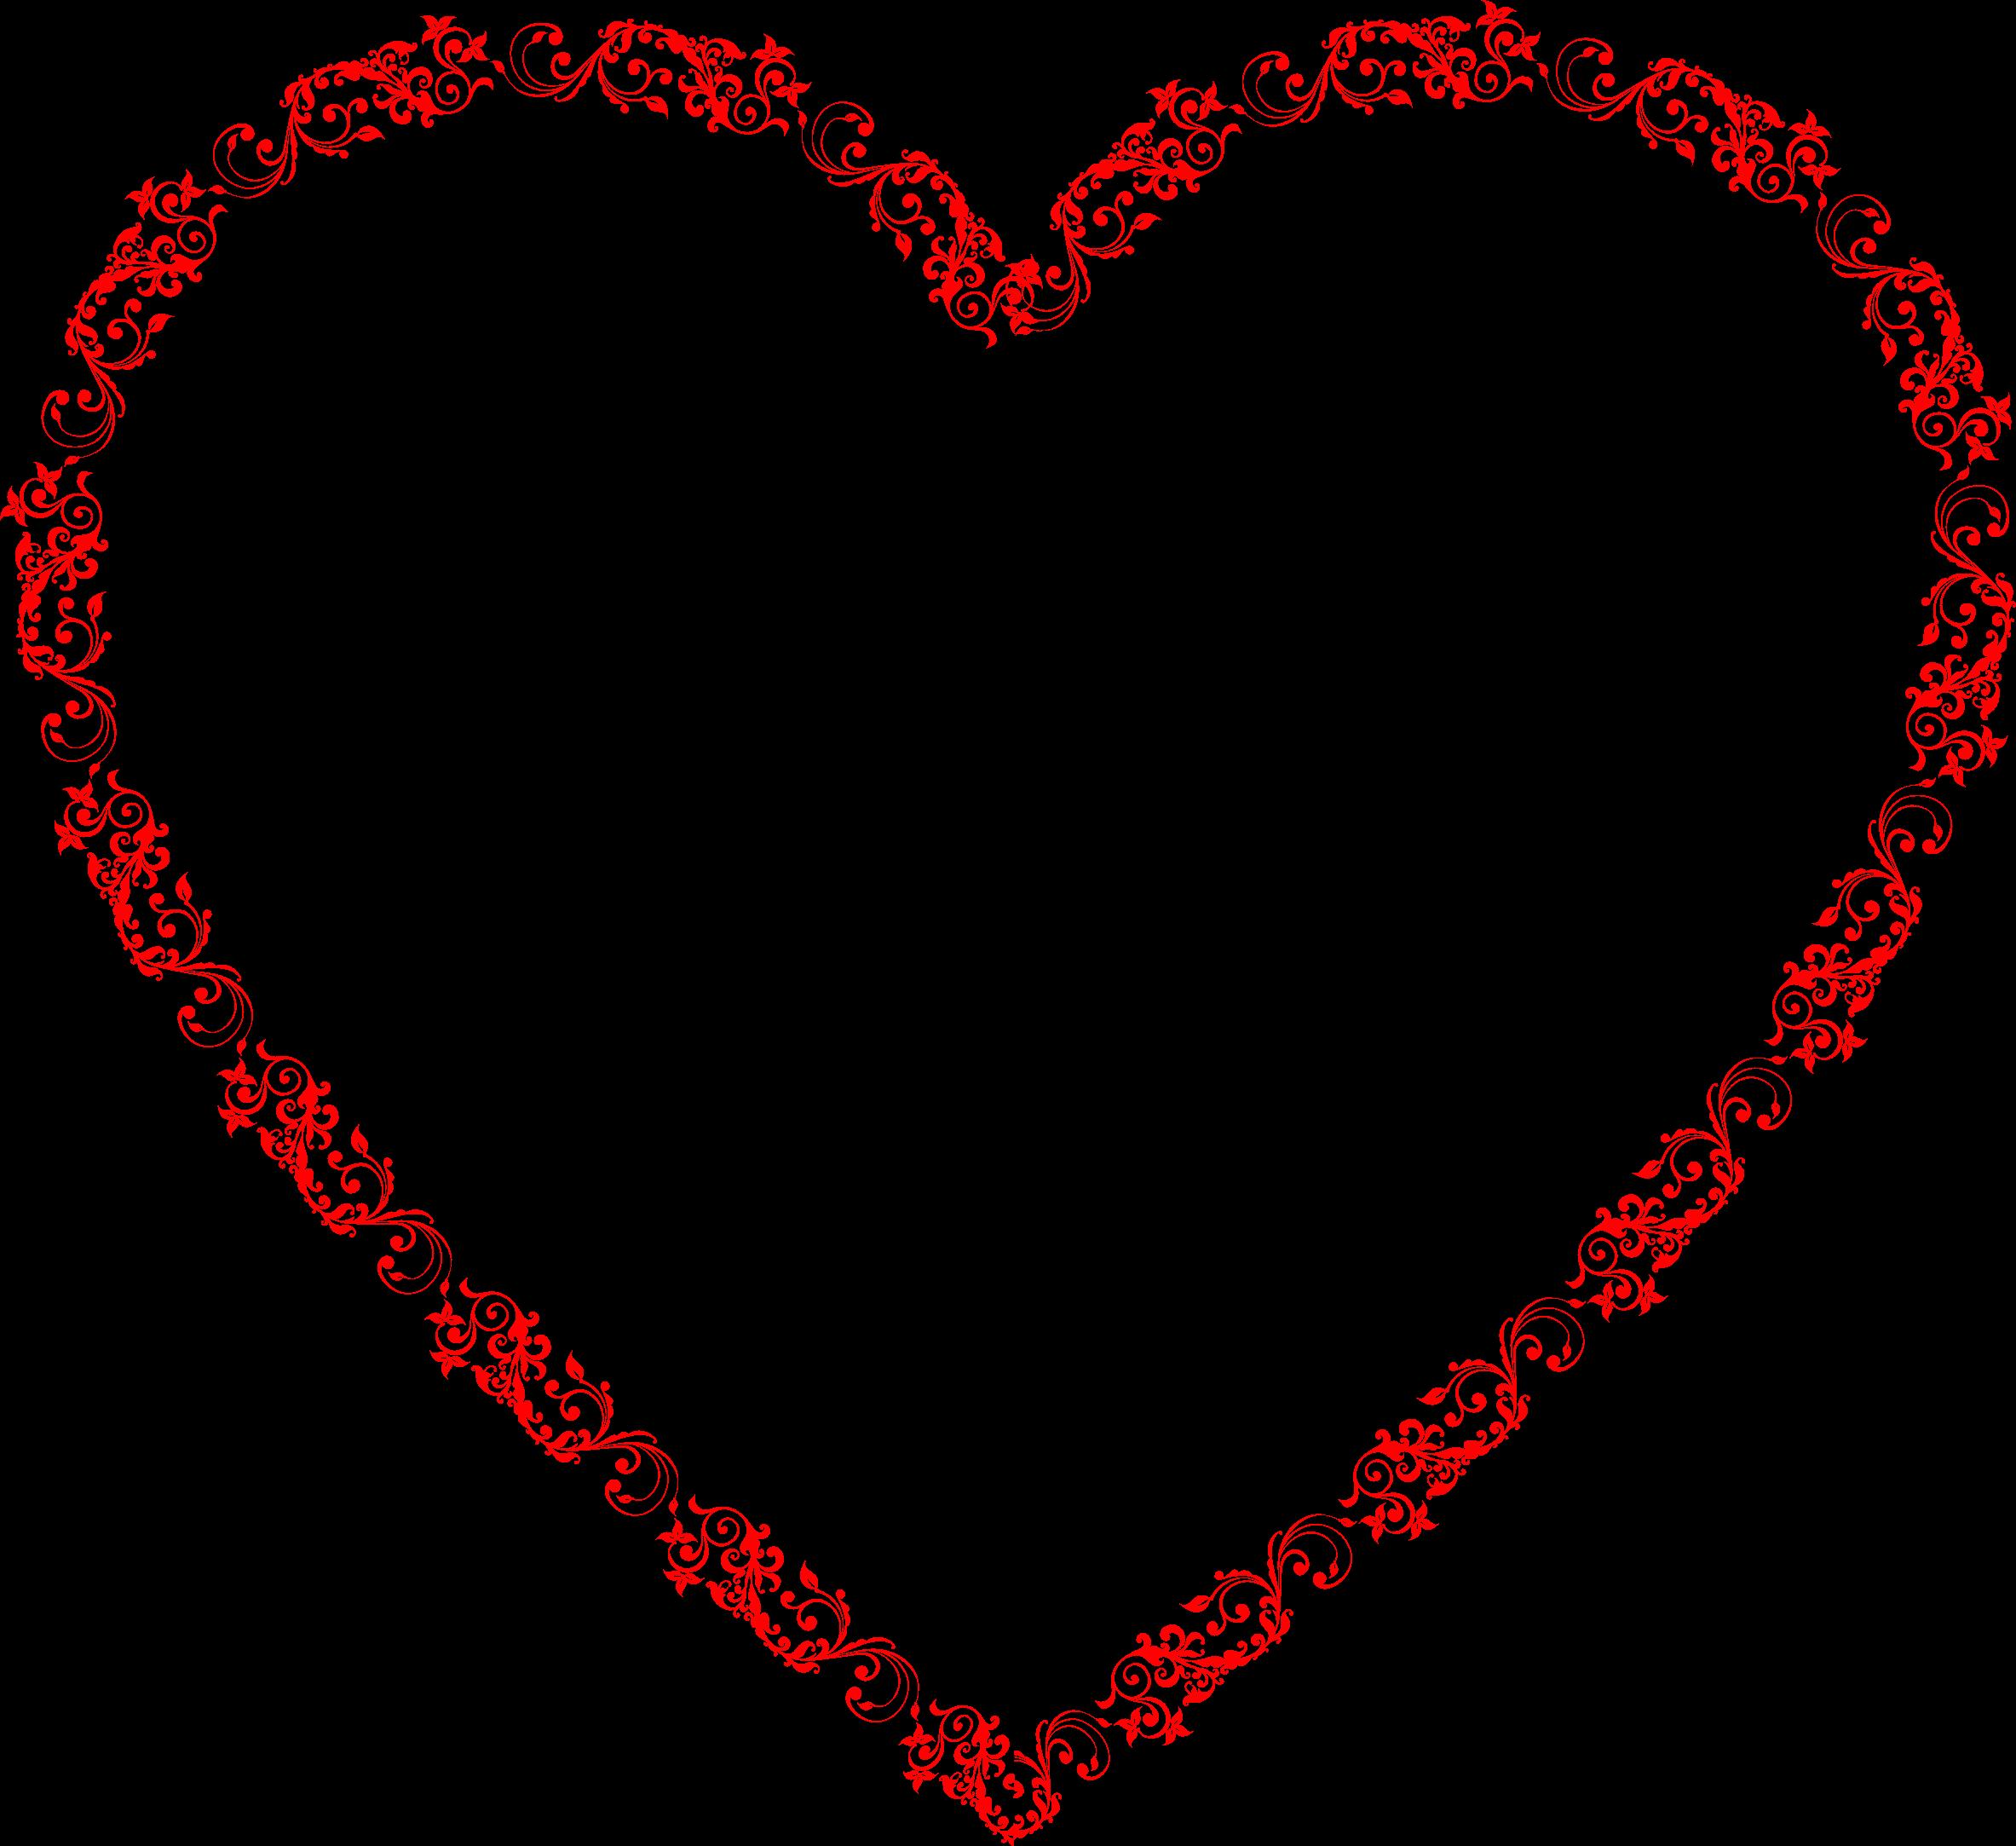 Flourish heart clipart clip freeuse download Clipart - Flourish Heart clip freeuse download